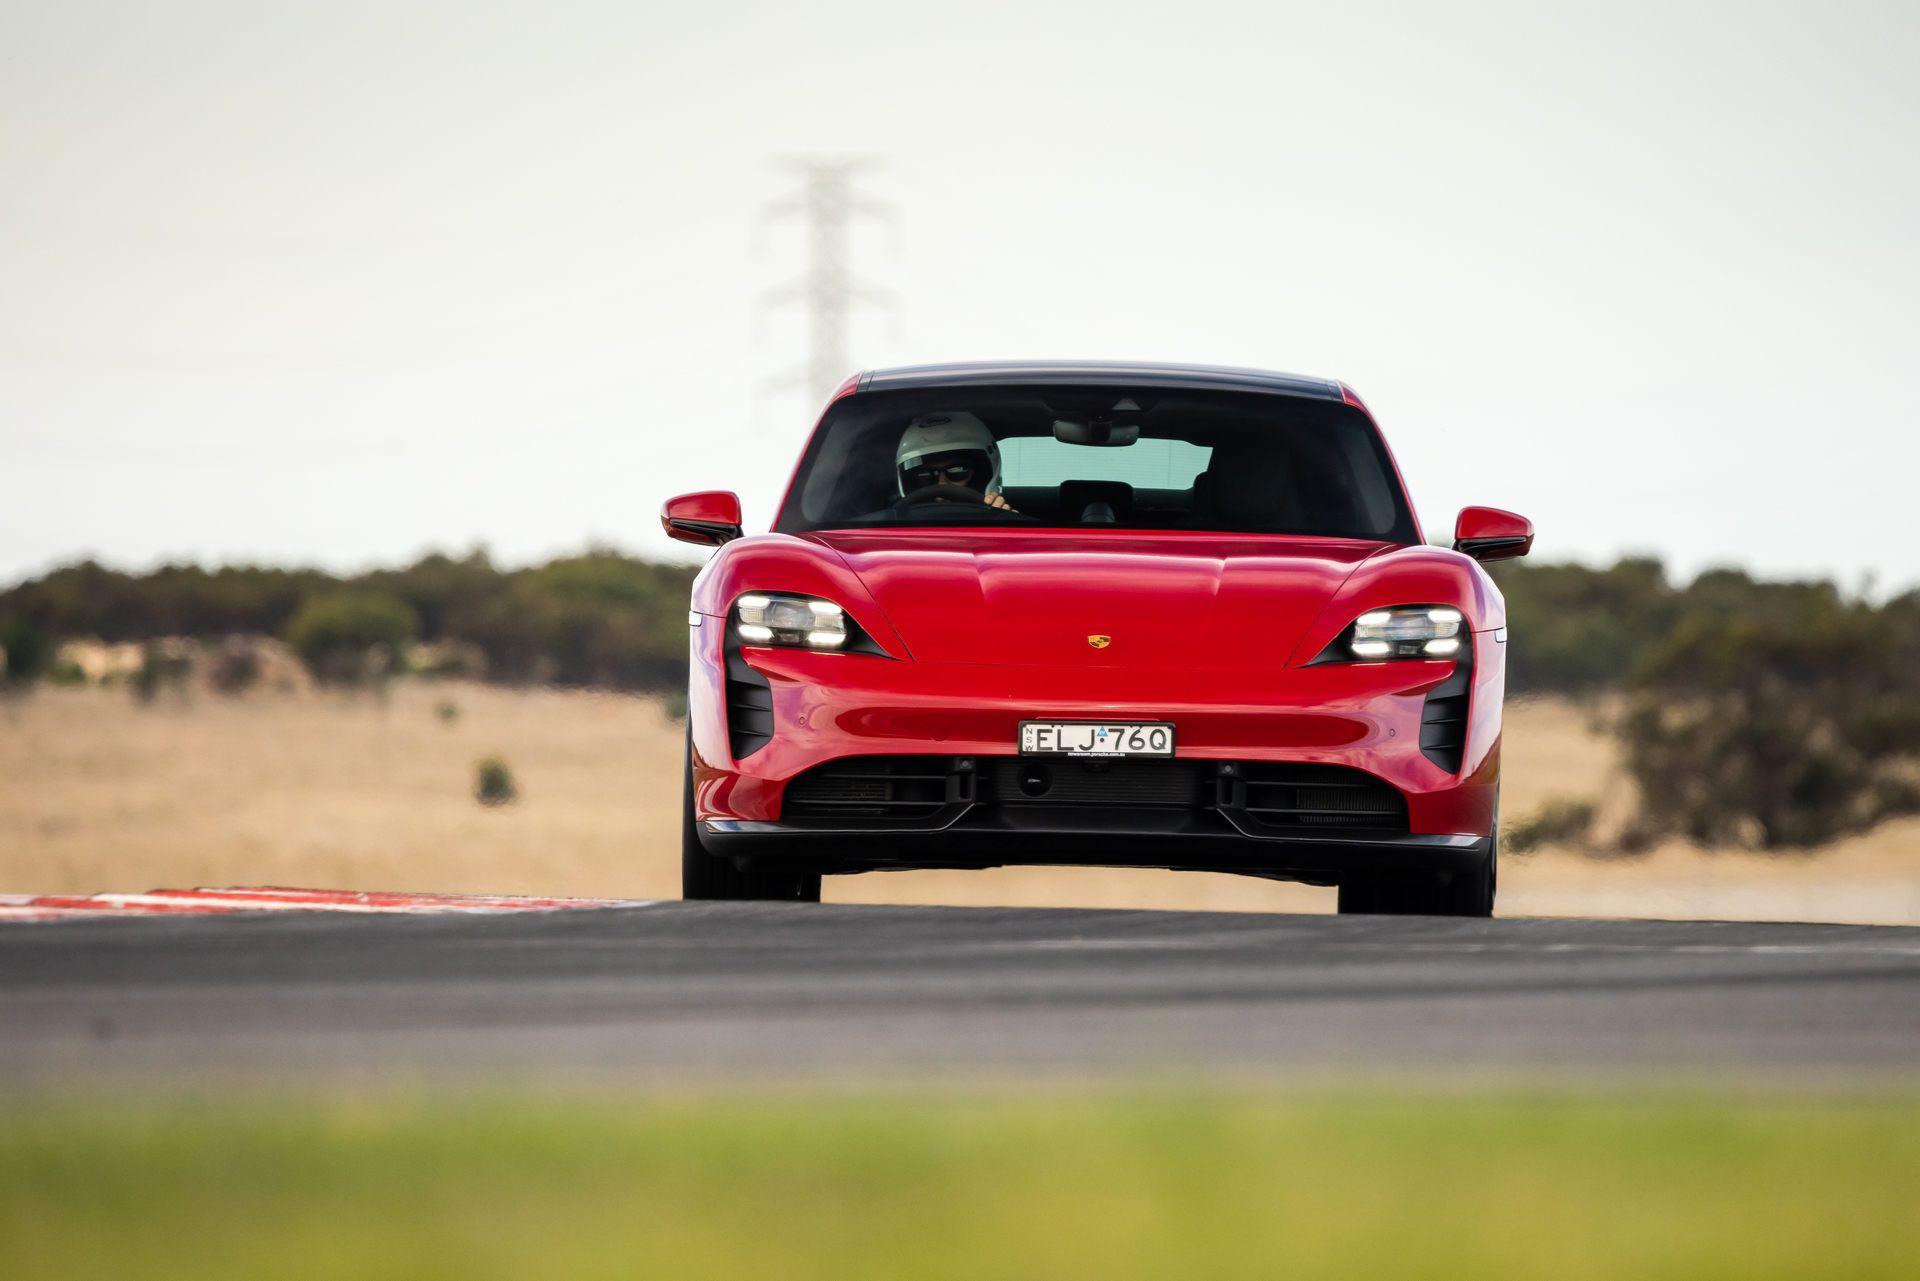 Porsche-Taycan-Turbo-S-The-Bend-Motorsport-Park-12